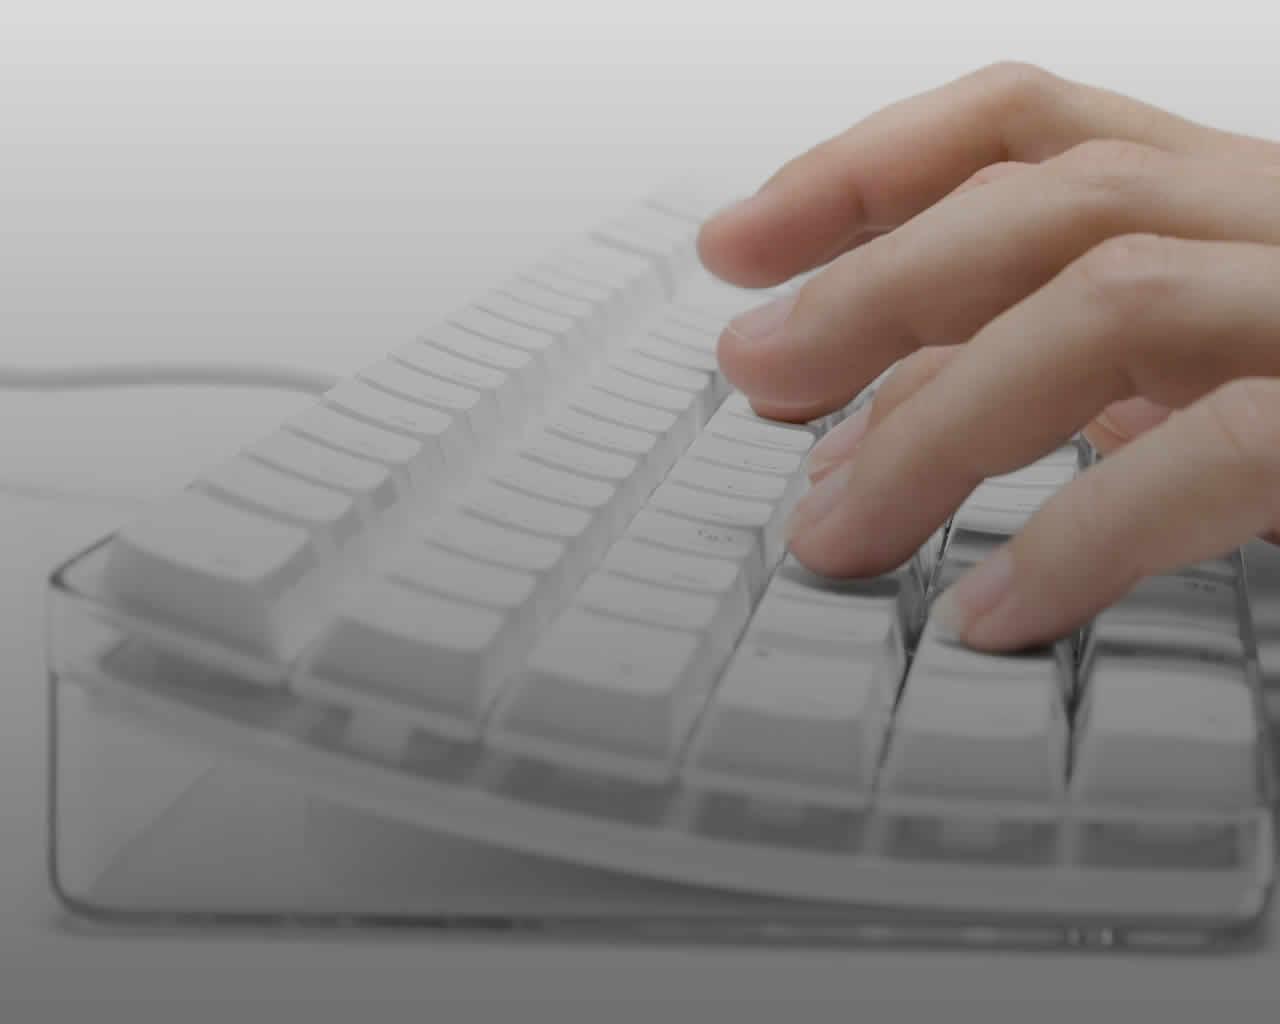 Forum zahnprothese siadingworkfu: Zahnprothese